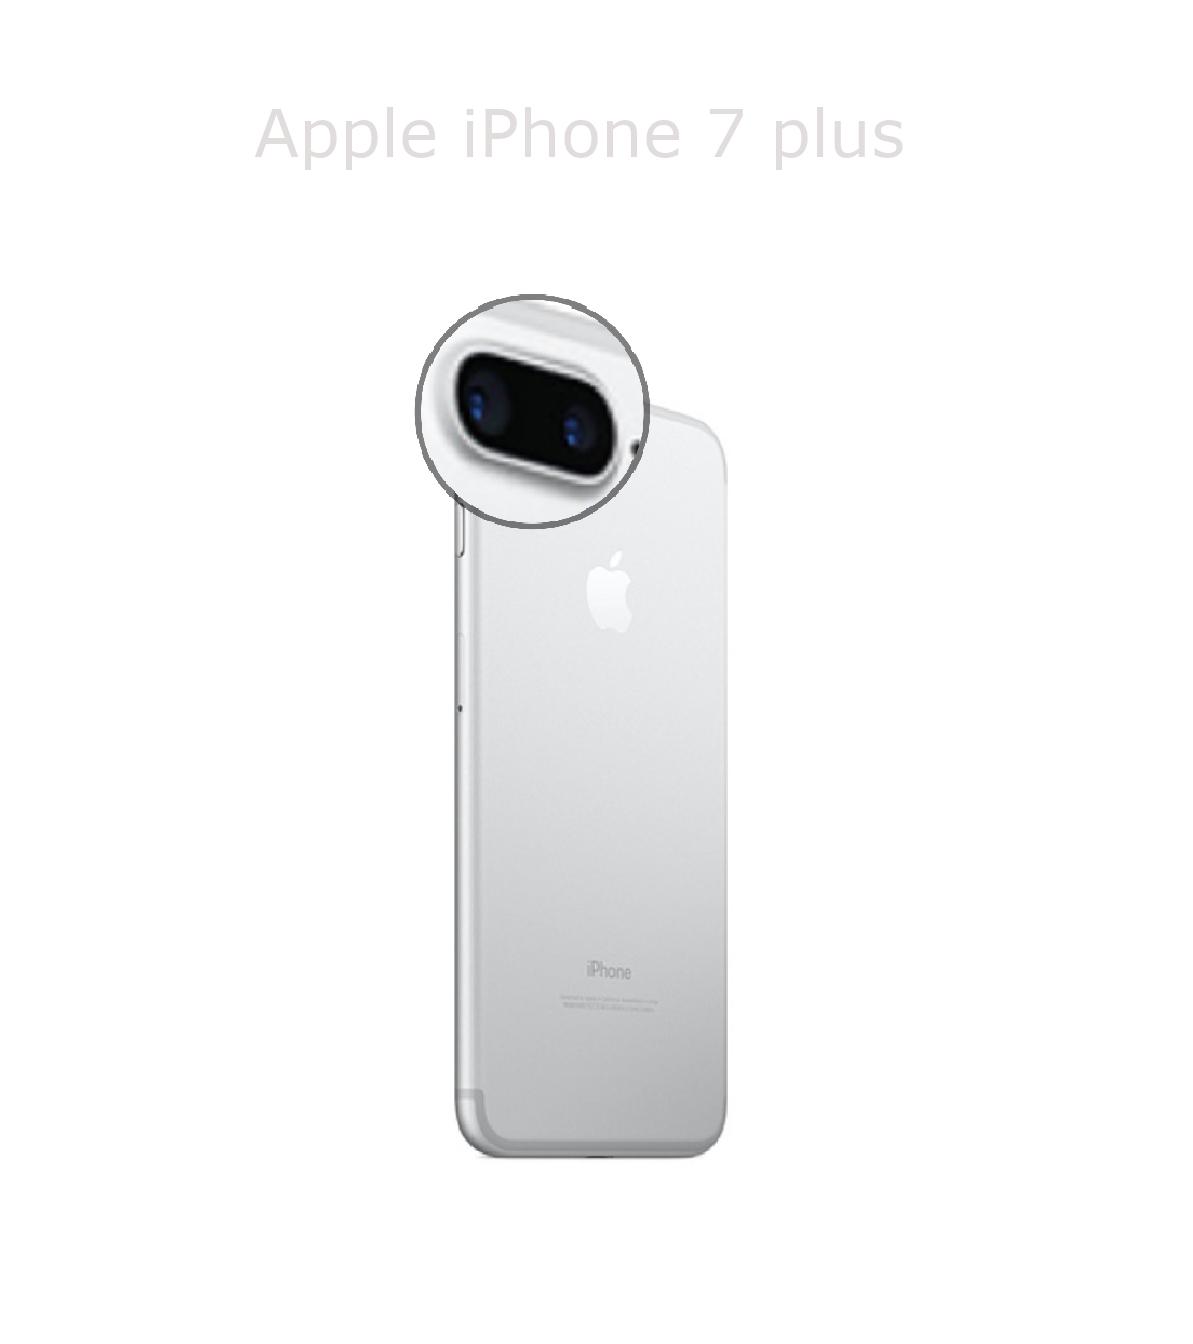 Laga kamera iPhone 7 plus